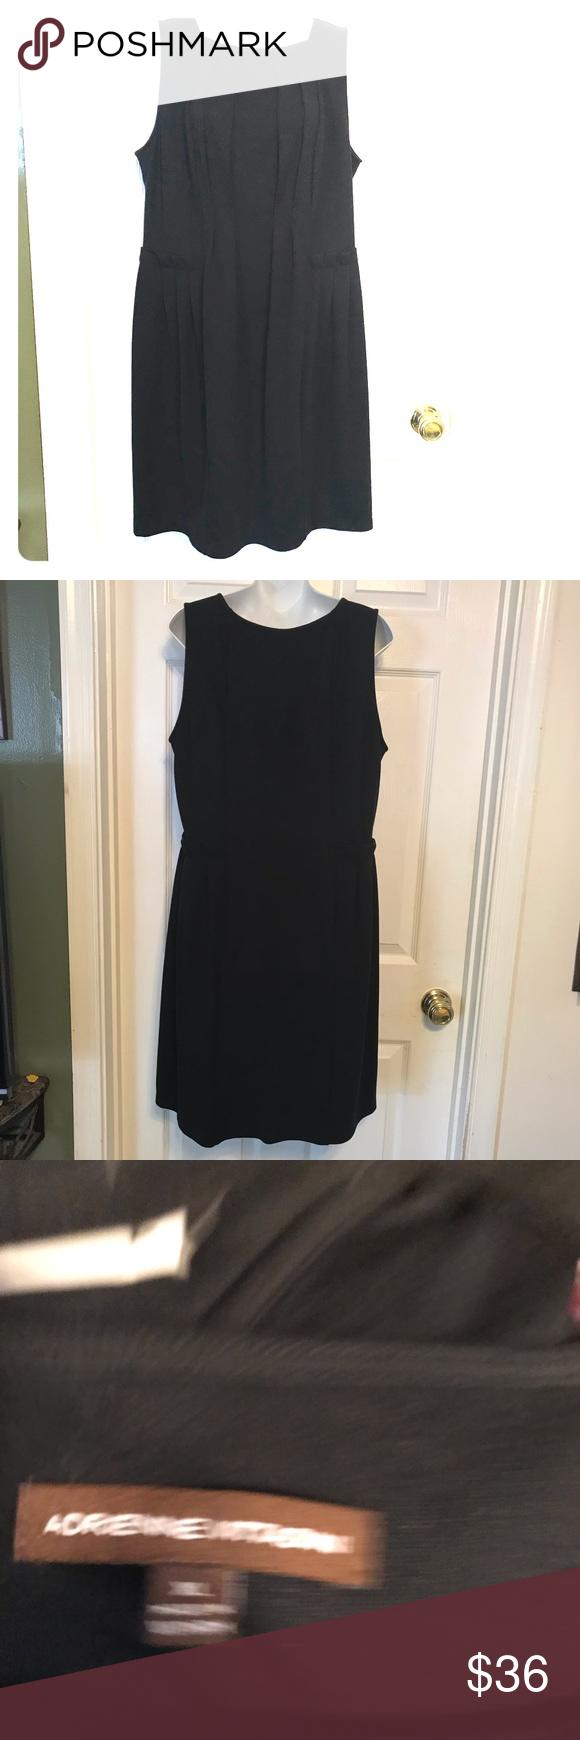 Adrienne Vittadini Black Dress In 2021 Dress Size Chart Women White Knee Length Dress Black Knit Dress [ 1740 x 580 Pixel ]